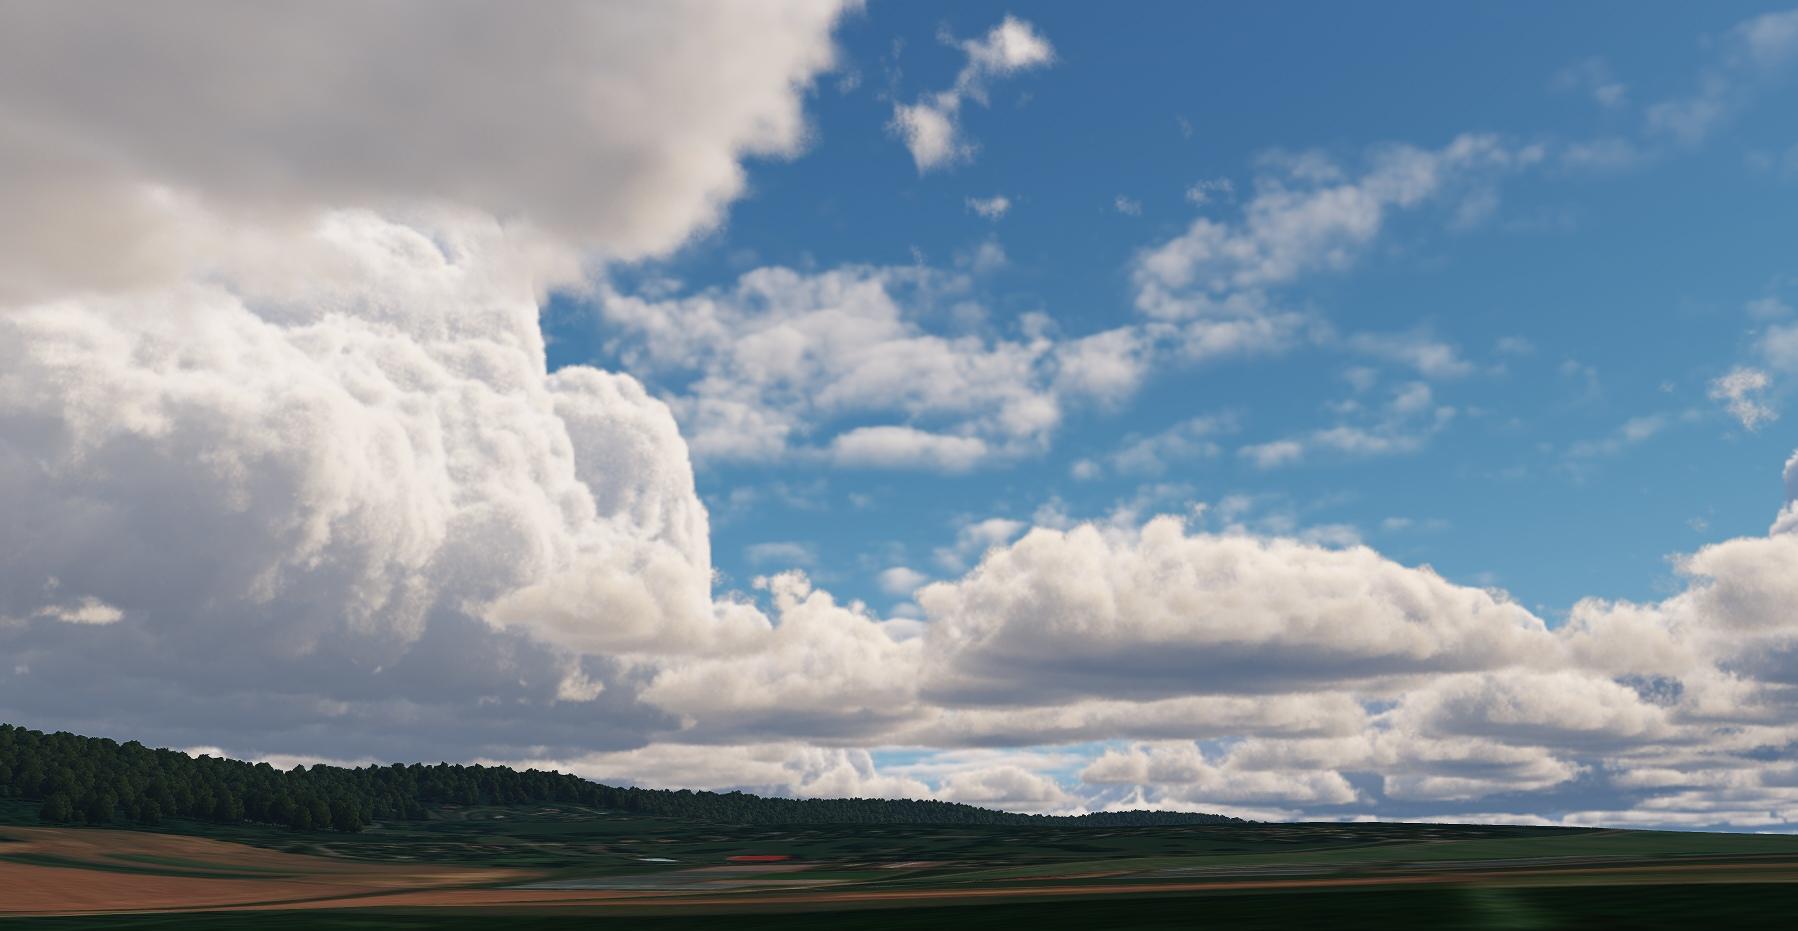 clouds wip 1 - 现代游戏开发实时3D引擎Unigine 2.12 RELEASED